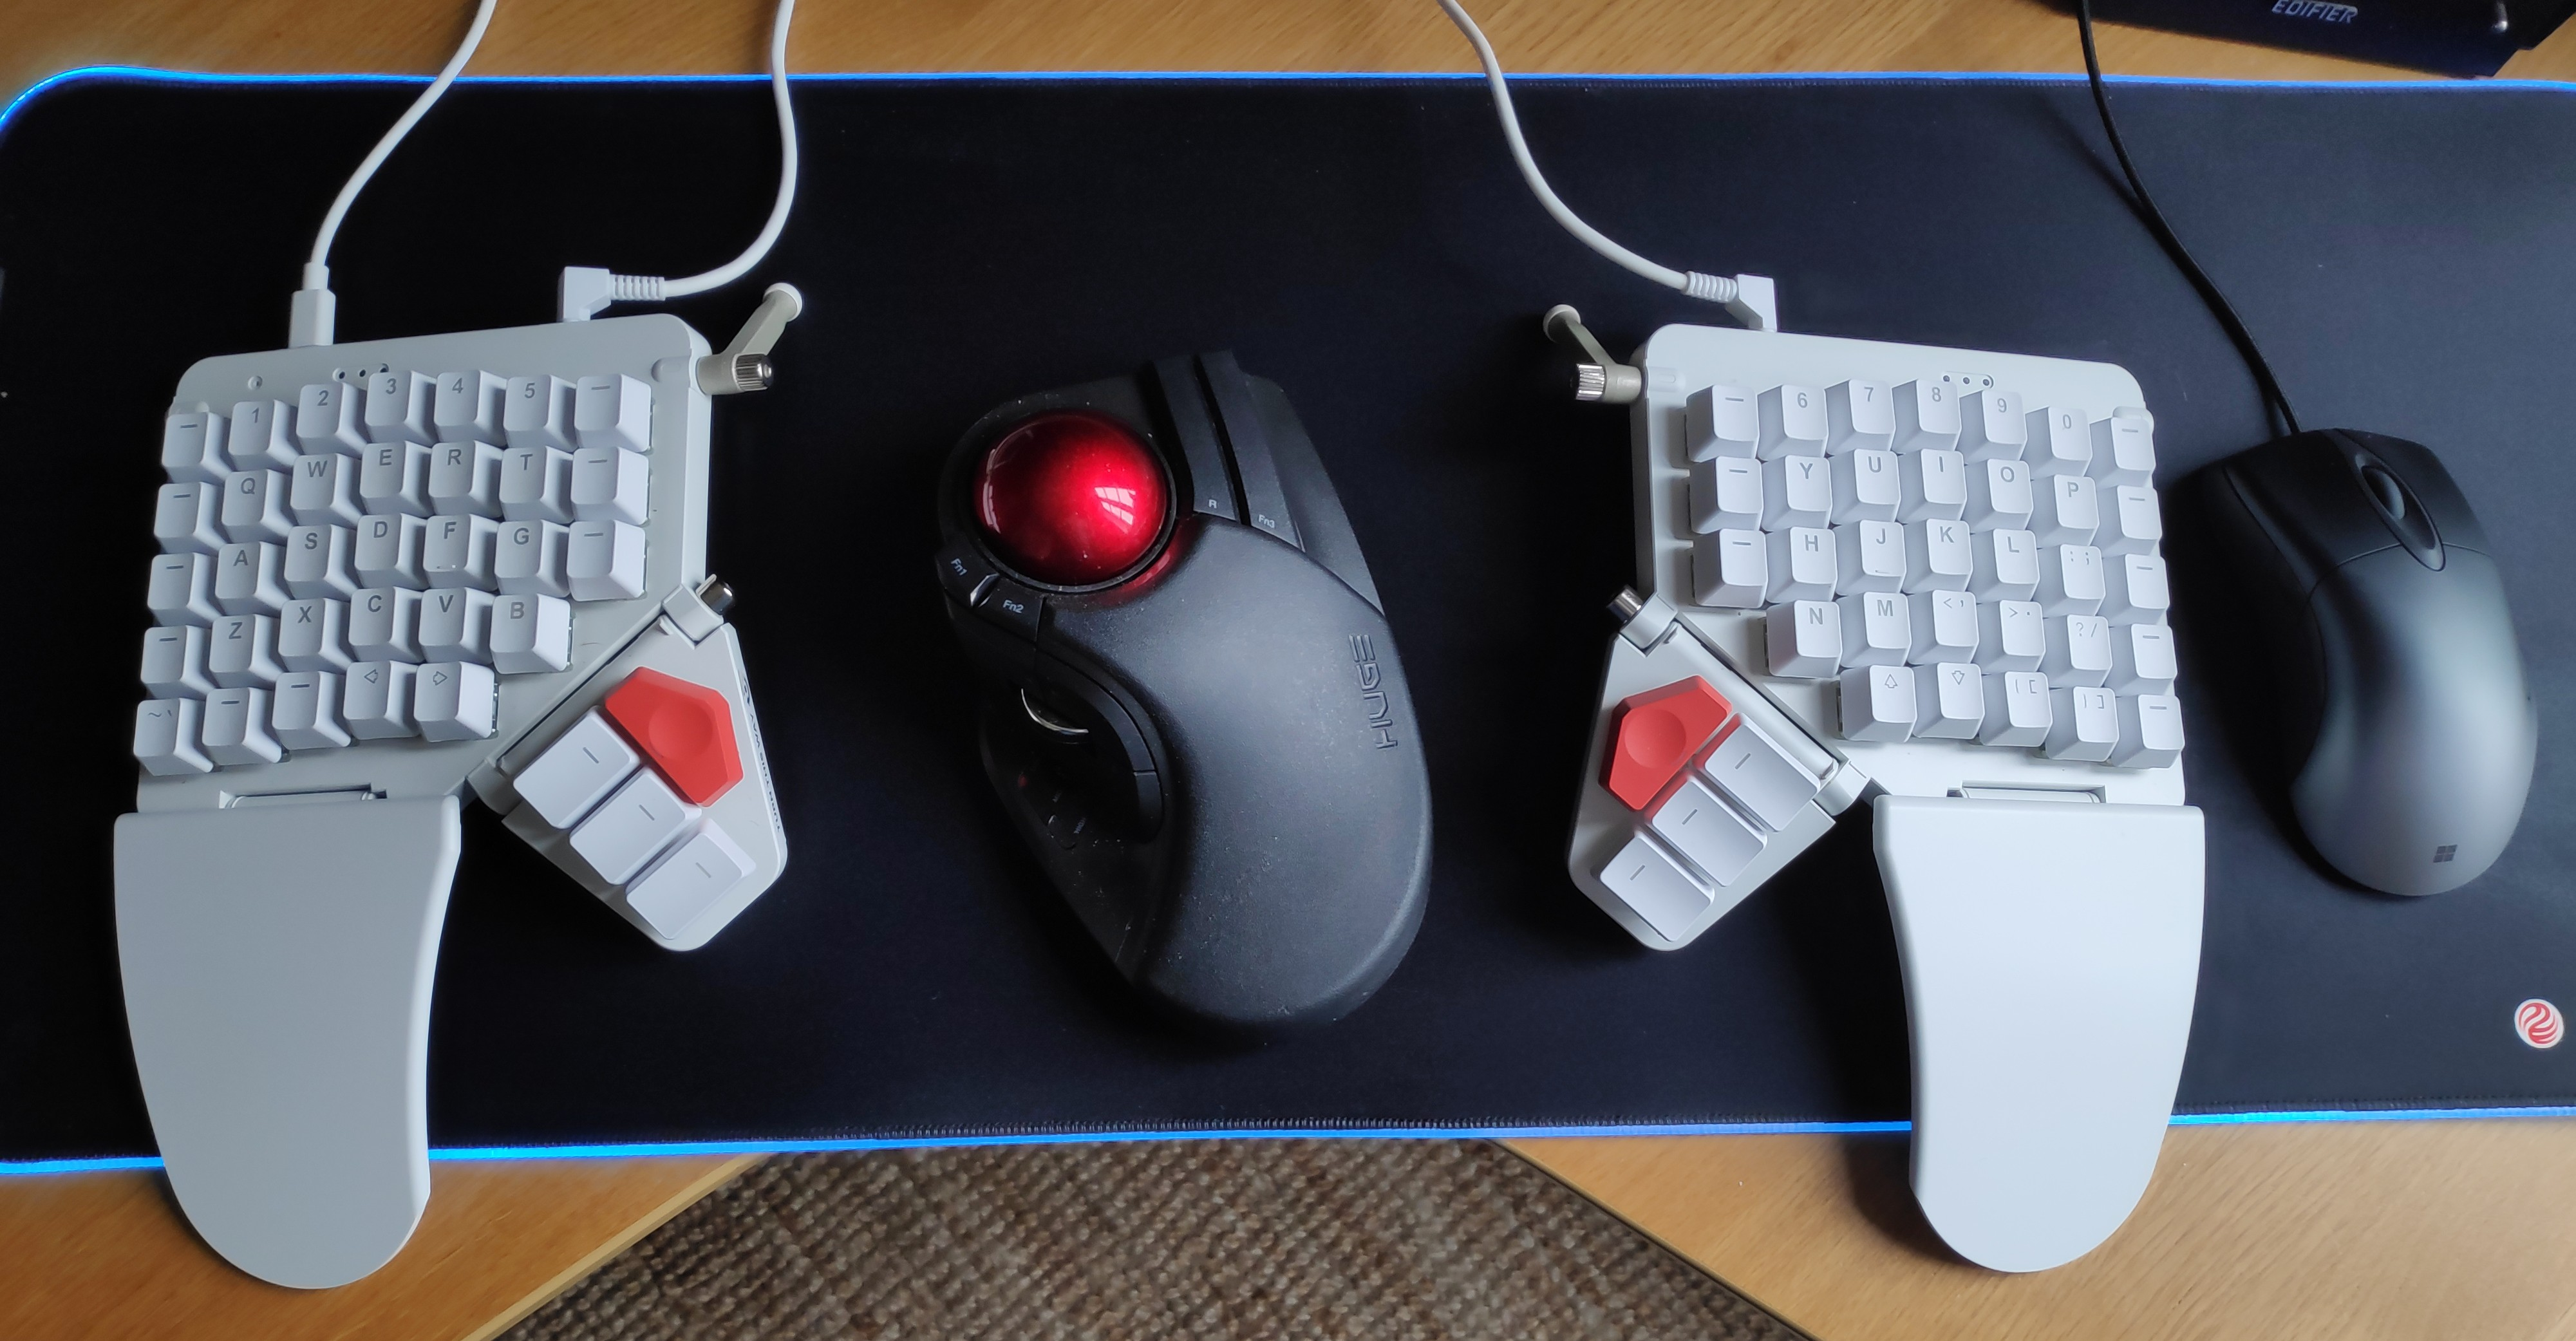 Office Peripherals